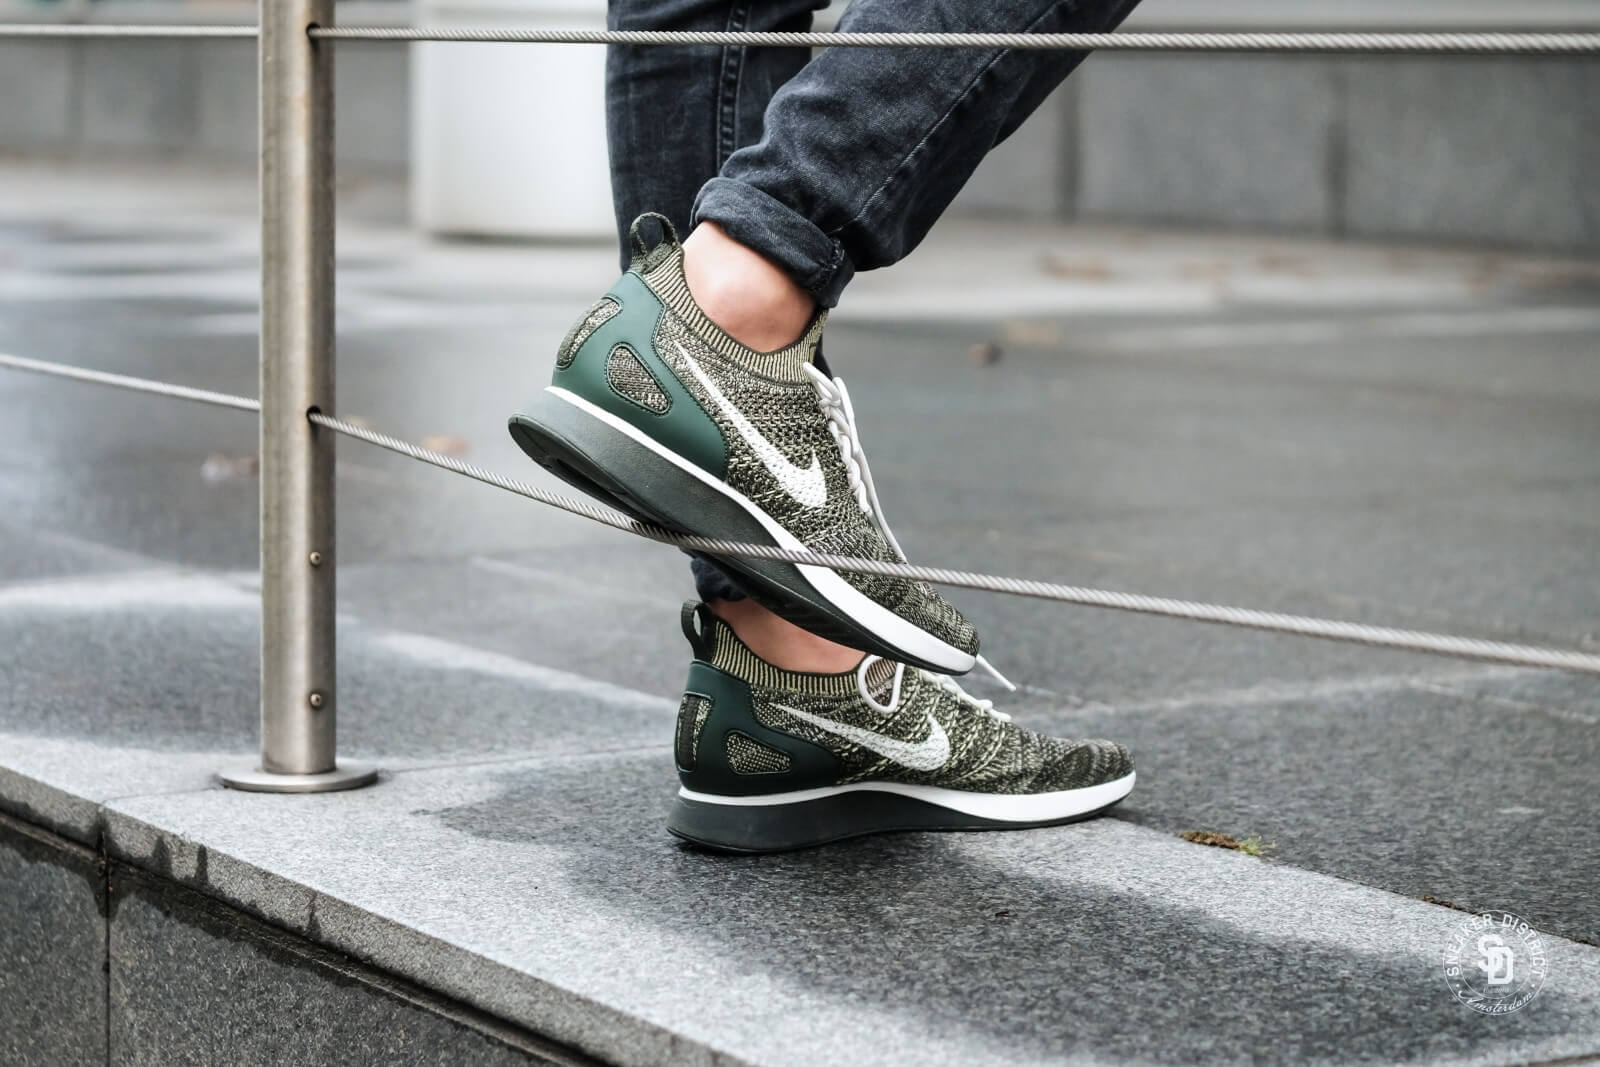 Nike Air Zoom Mariah Flyknit Racer Sequoia/Neutral Olive-Light Bone -  918264-301